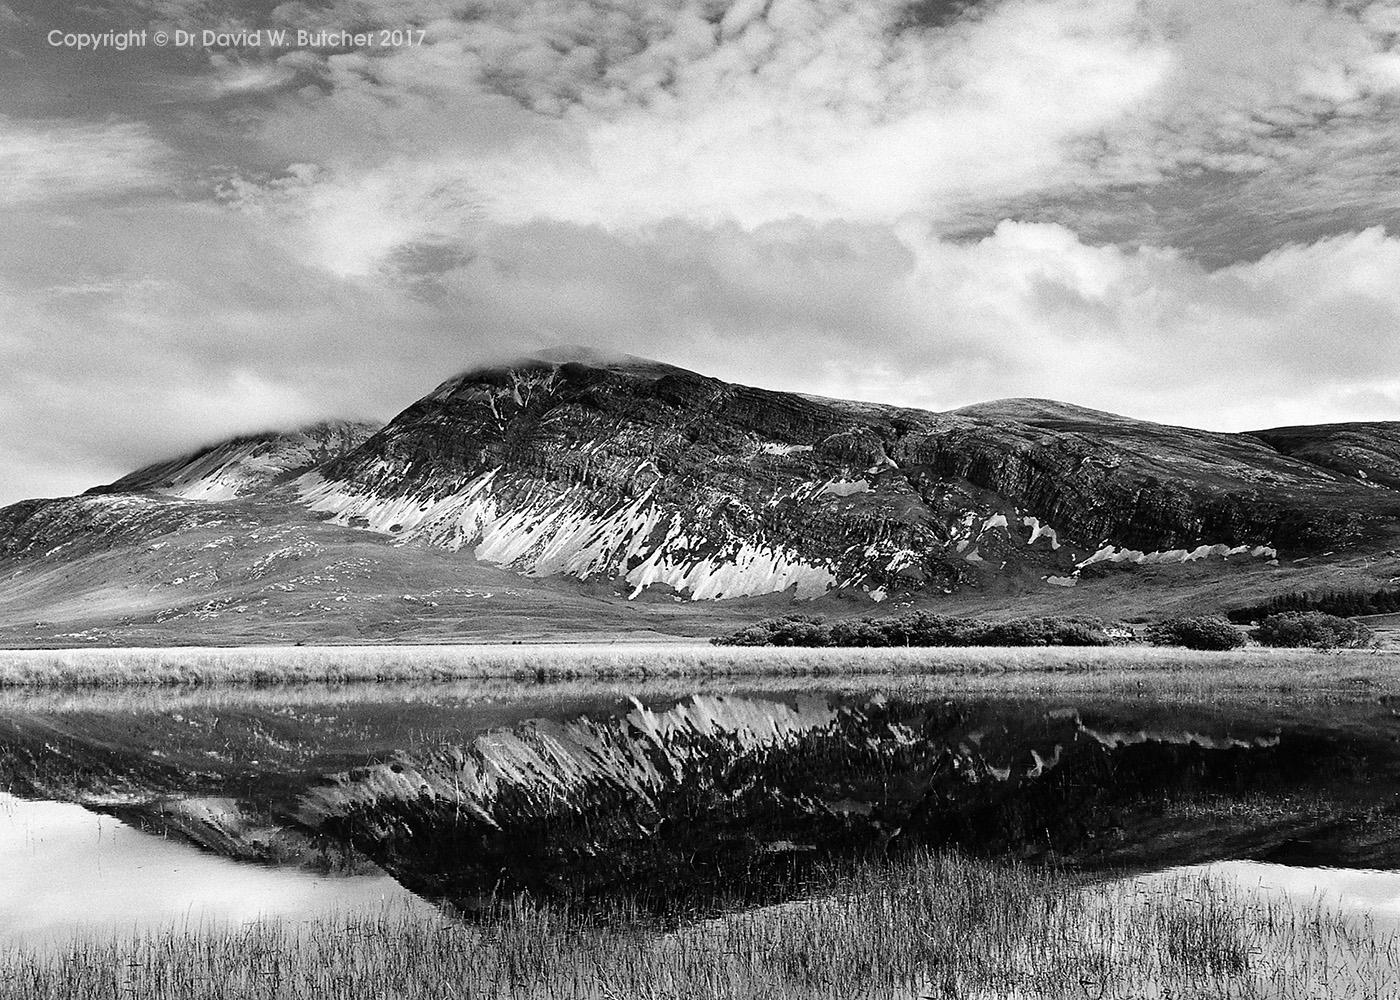 Arkle reflections, Sutherland, Scotland